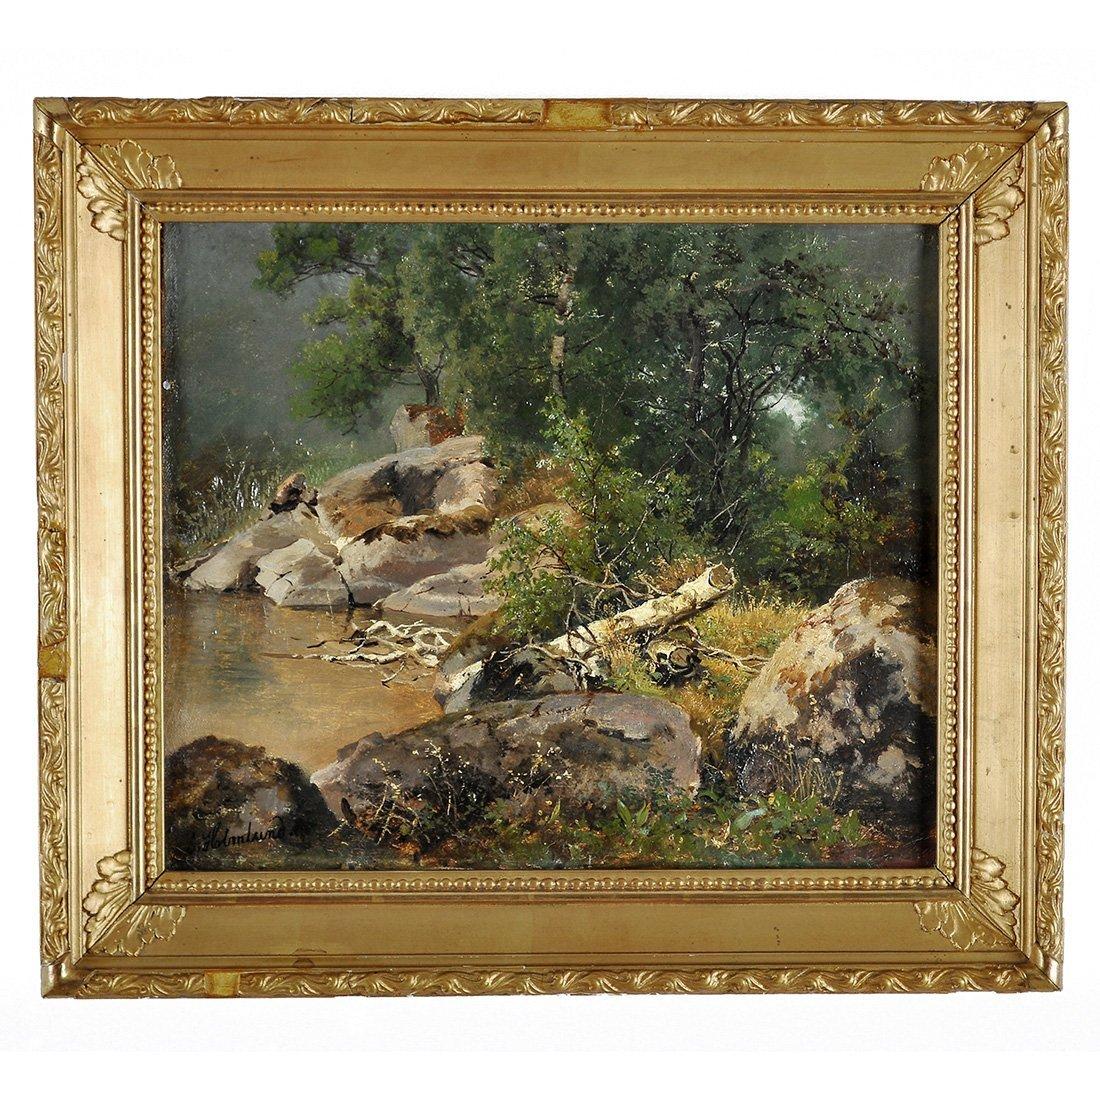 7: JOSEFINA HOLMLUND (1827-1905), olja på duk